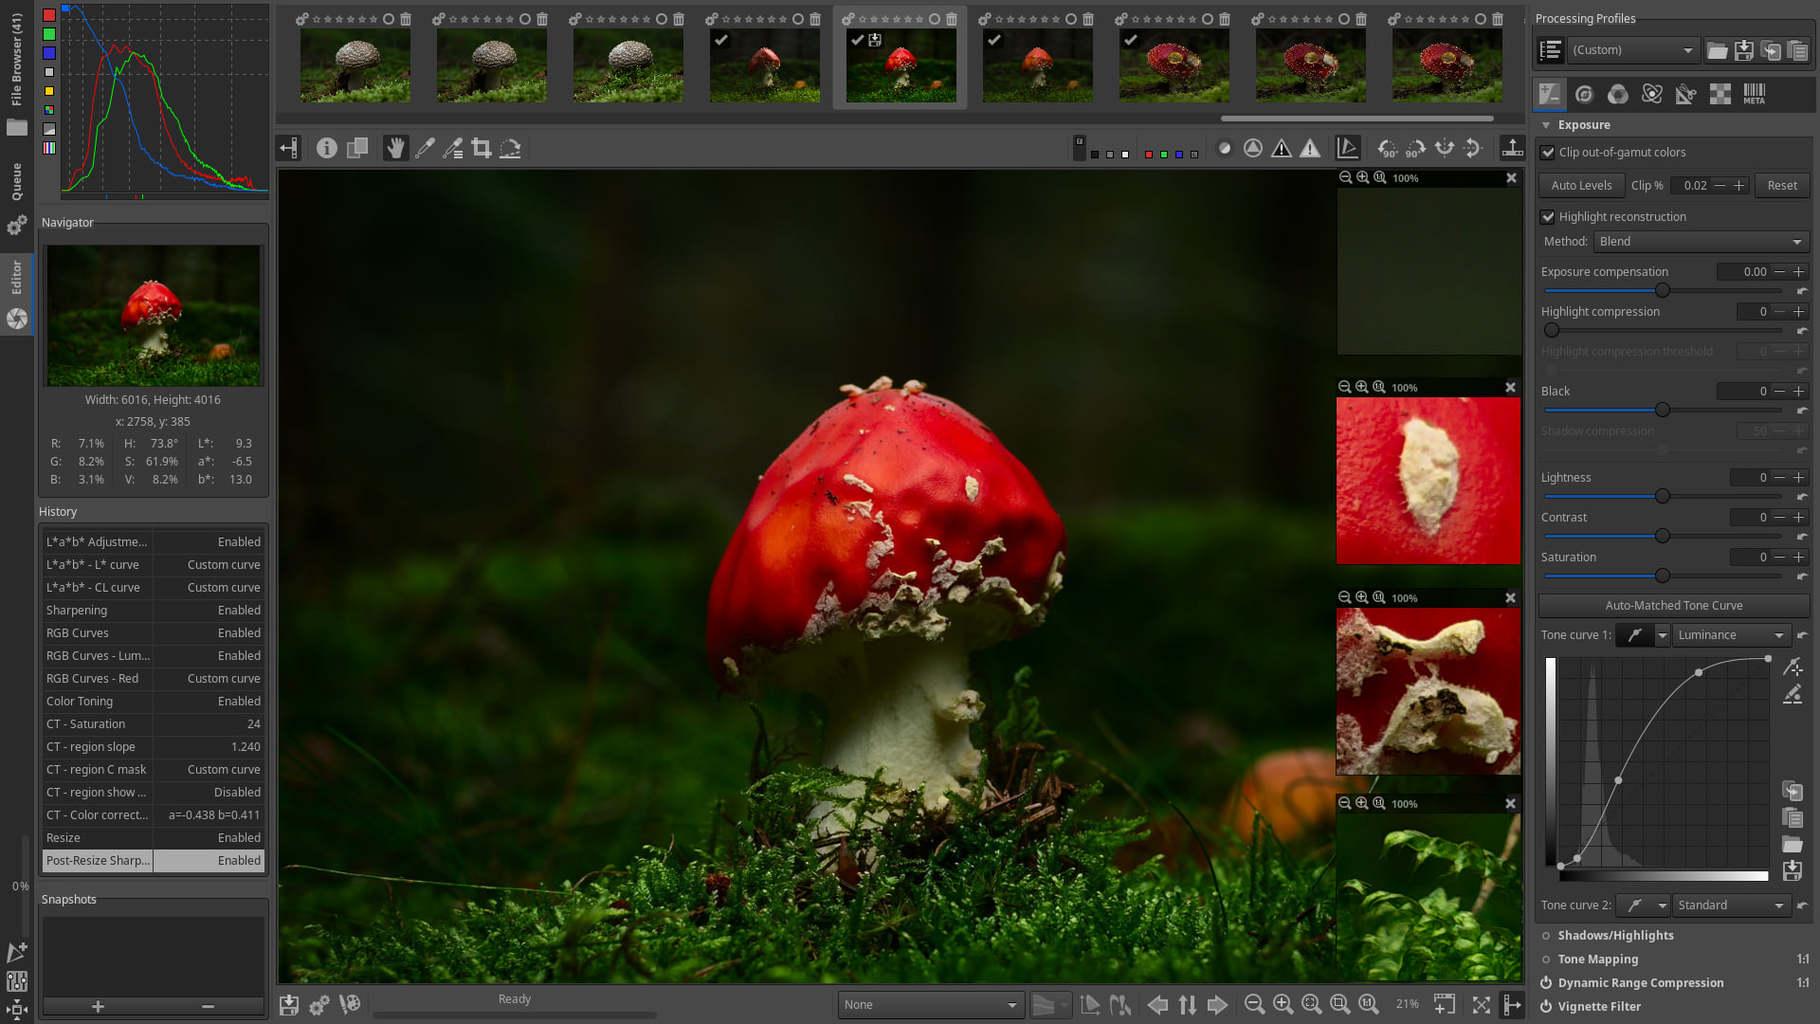 Interfaz del editor de fotos gratuito Rawtherapee